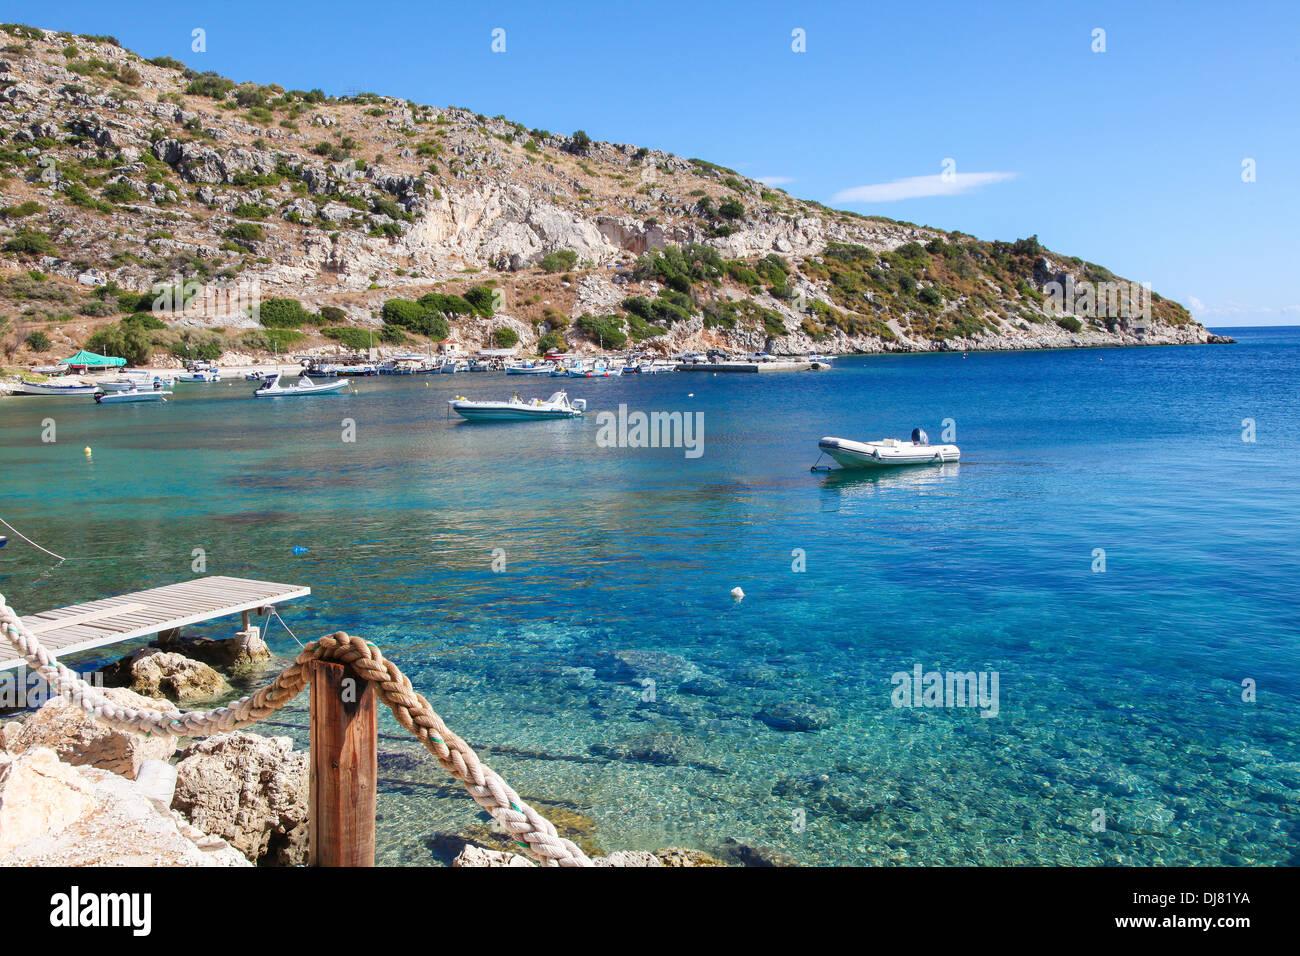 ZAKYNTHOS, GREECE - SEPT 21: Small boats at a beach in Zakynthos, Ionian islands, Greece, on September 21, 2013. - Stock Image